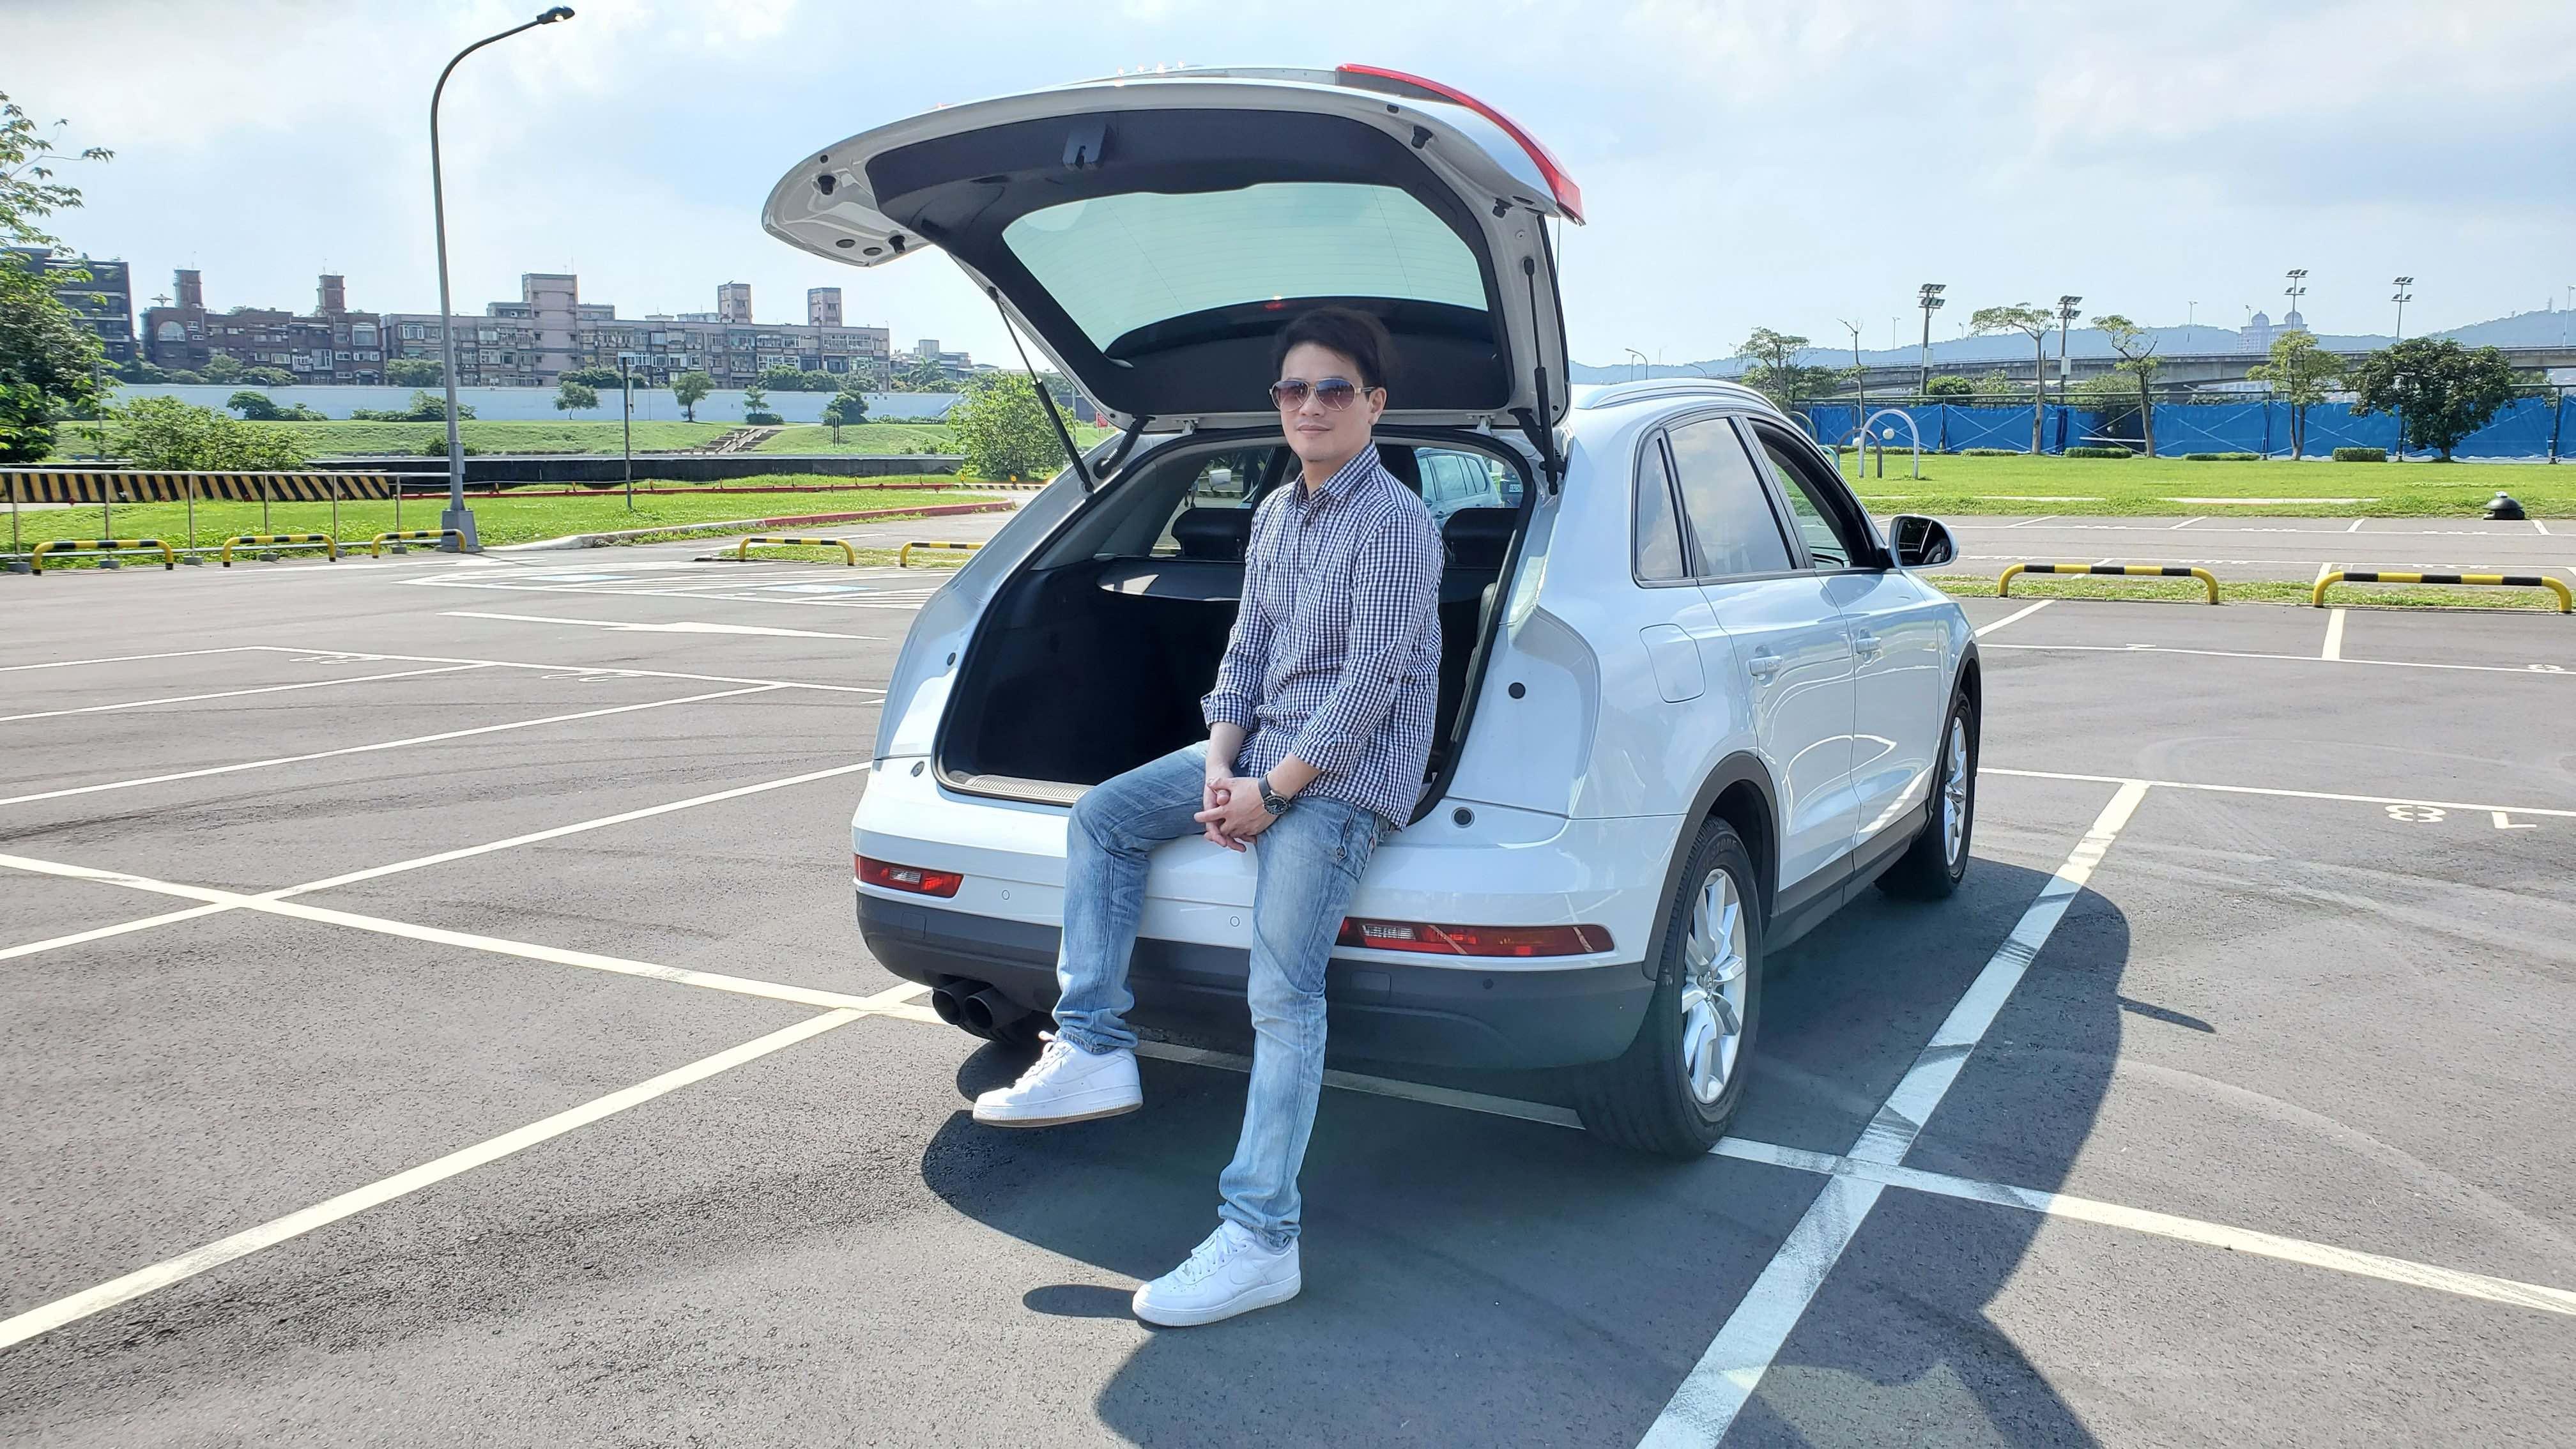 ▲Audi Q3 Sportback有休旅車空間,加上動感的斜背設計,擄獲楊正磊和家人的心。